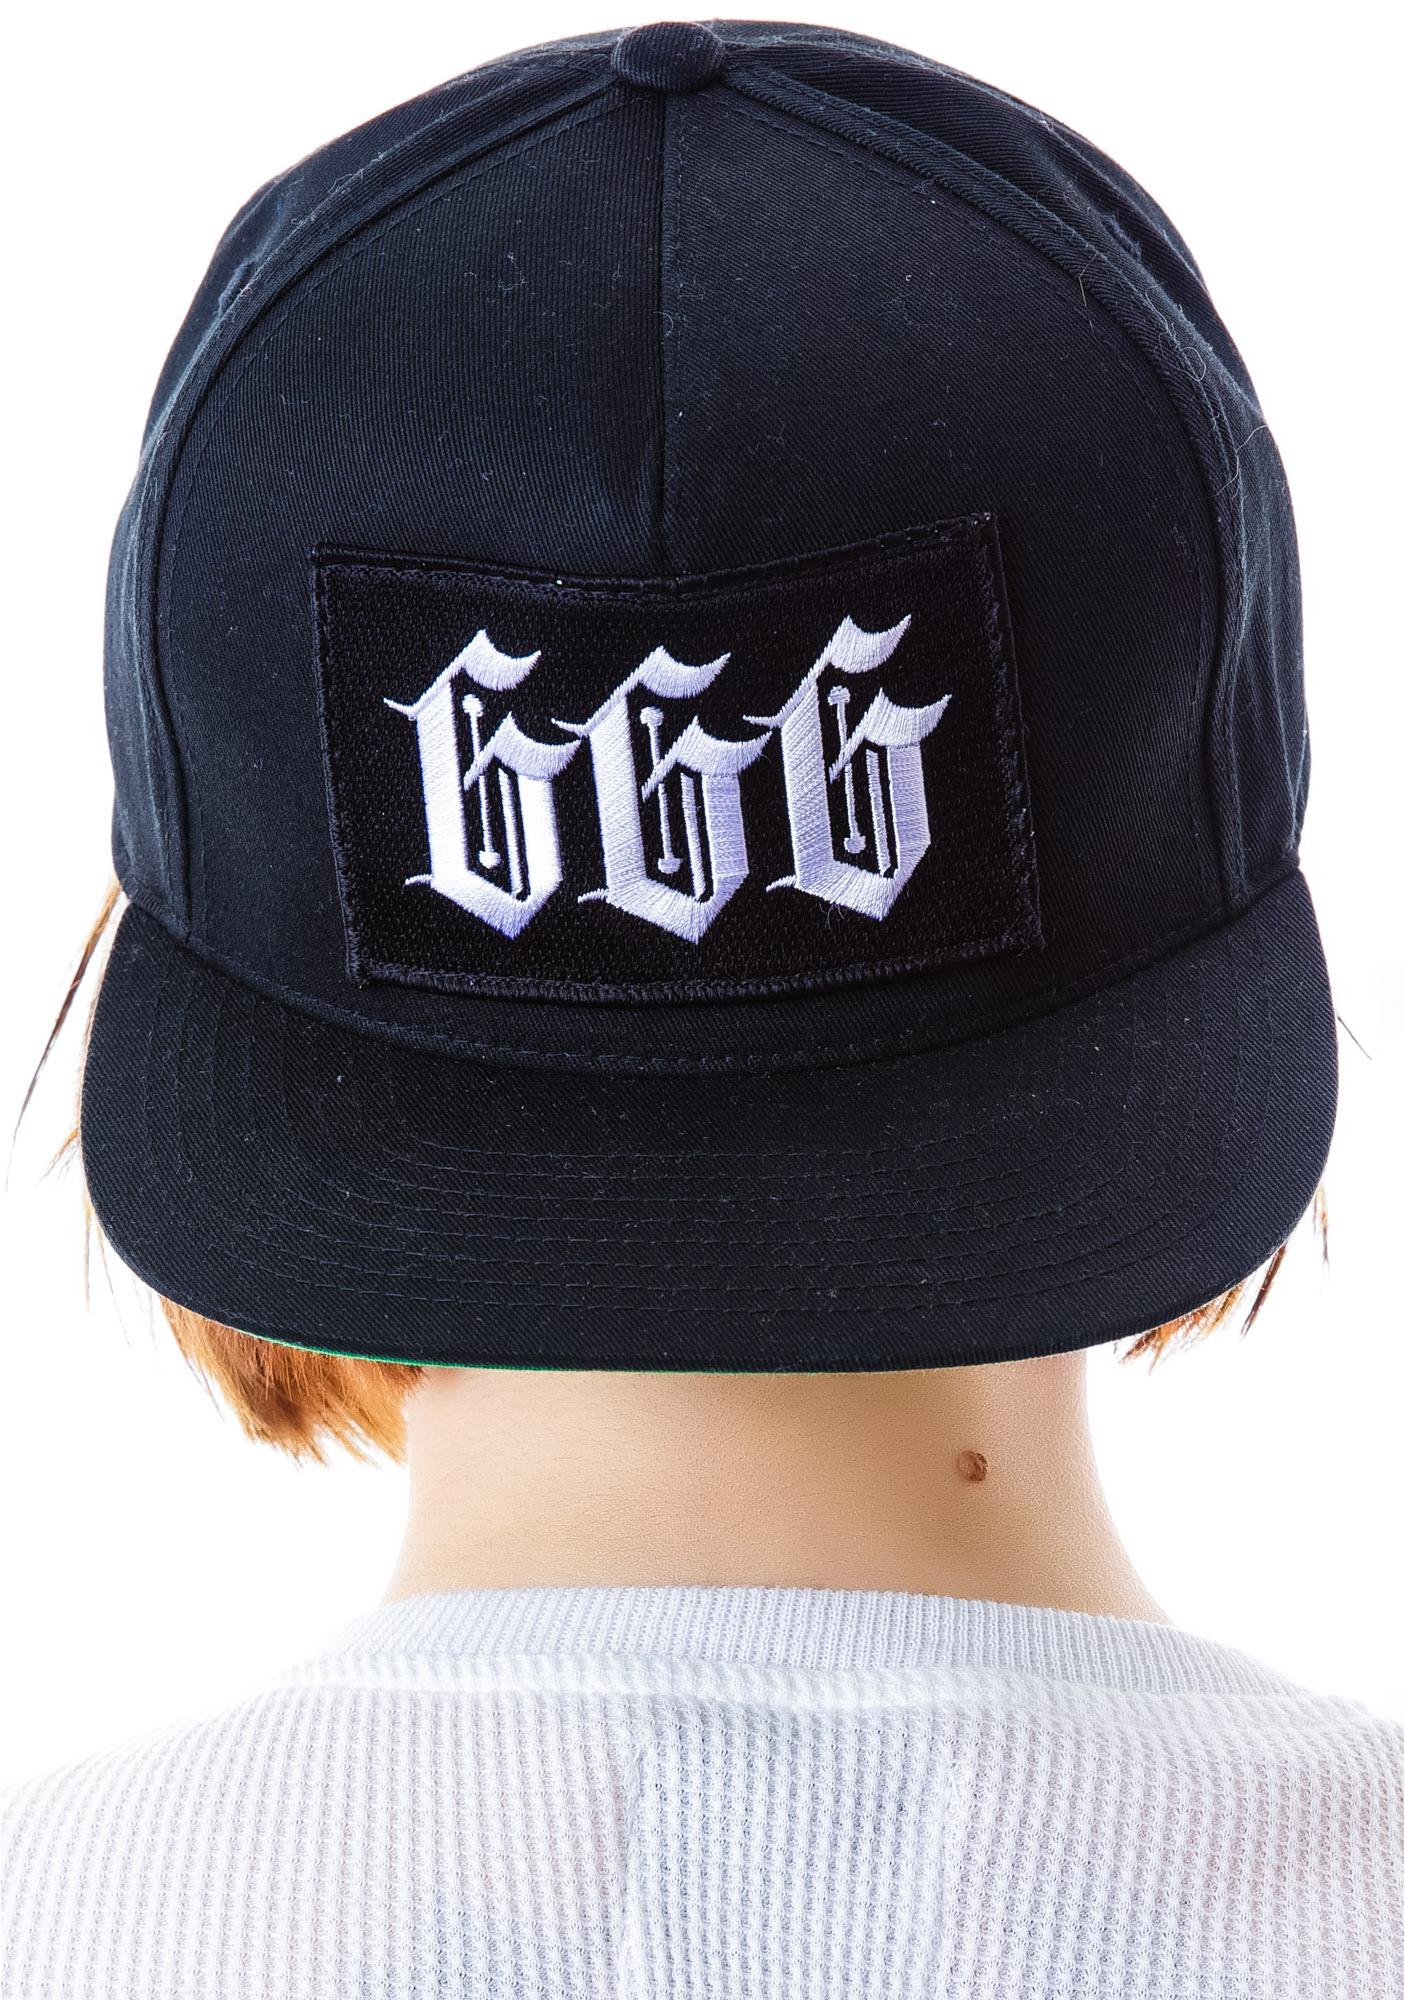 Blackcraft 666 Hat